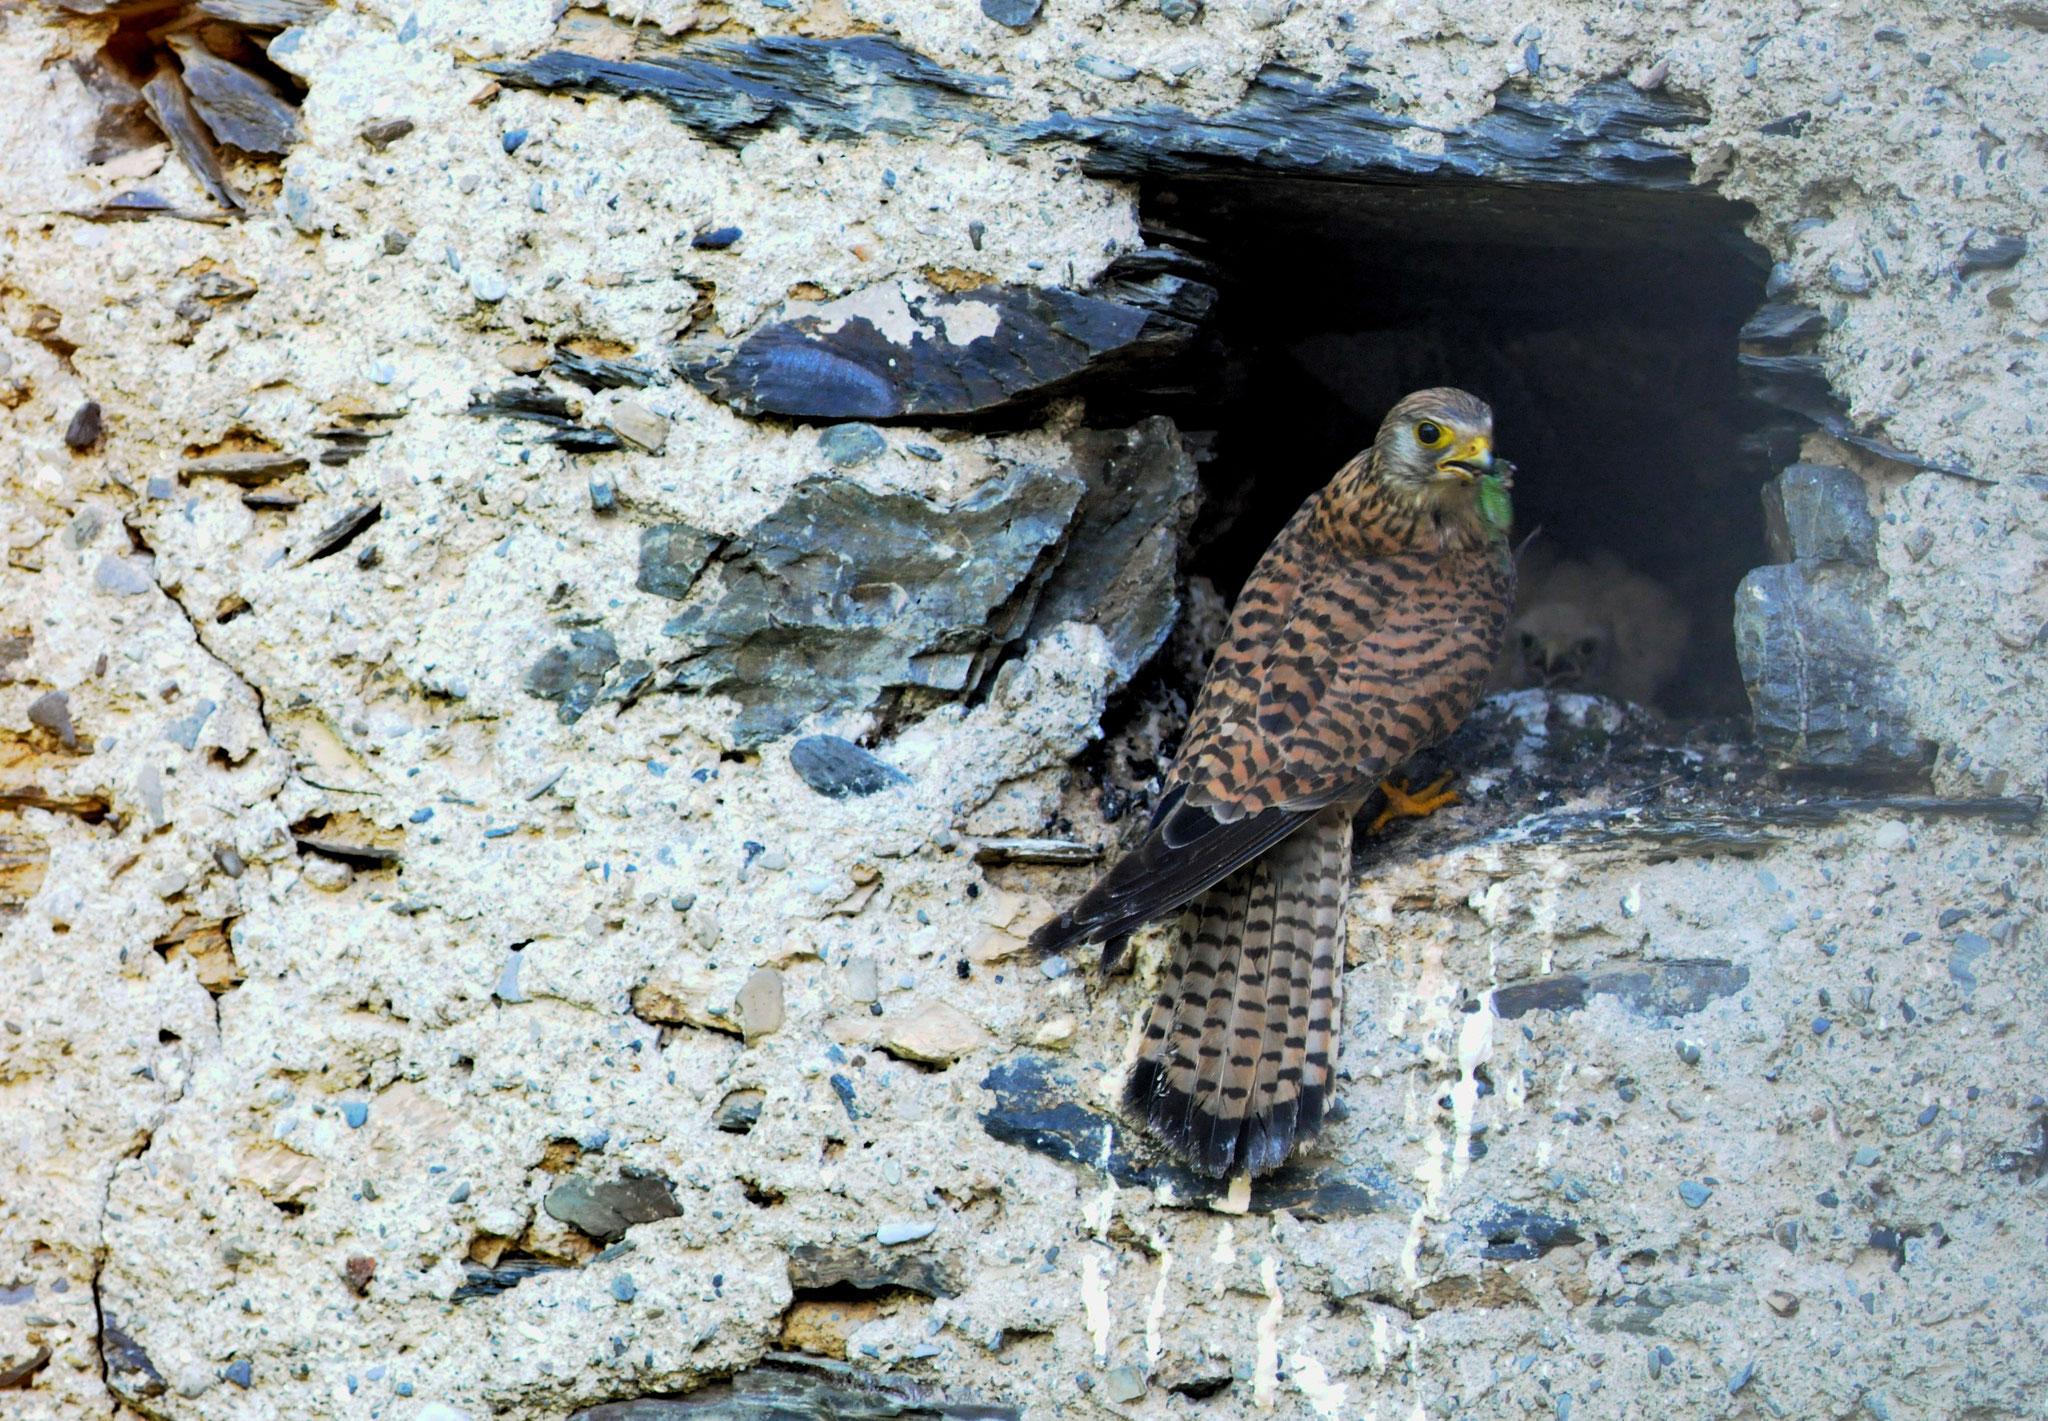 """je ne suis ni l'aile droite ,ni l'aile gauche je suis l'oiseau ""      proverbe indien (Photo F. Fourcade)"